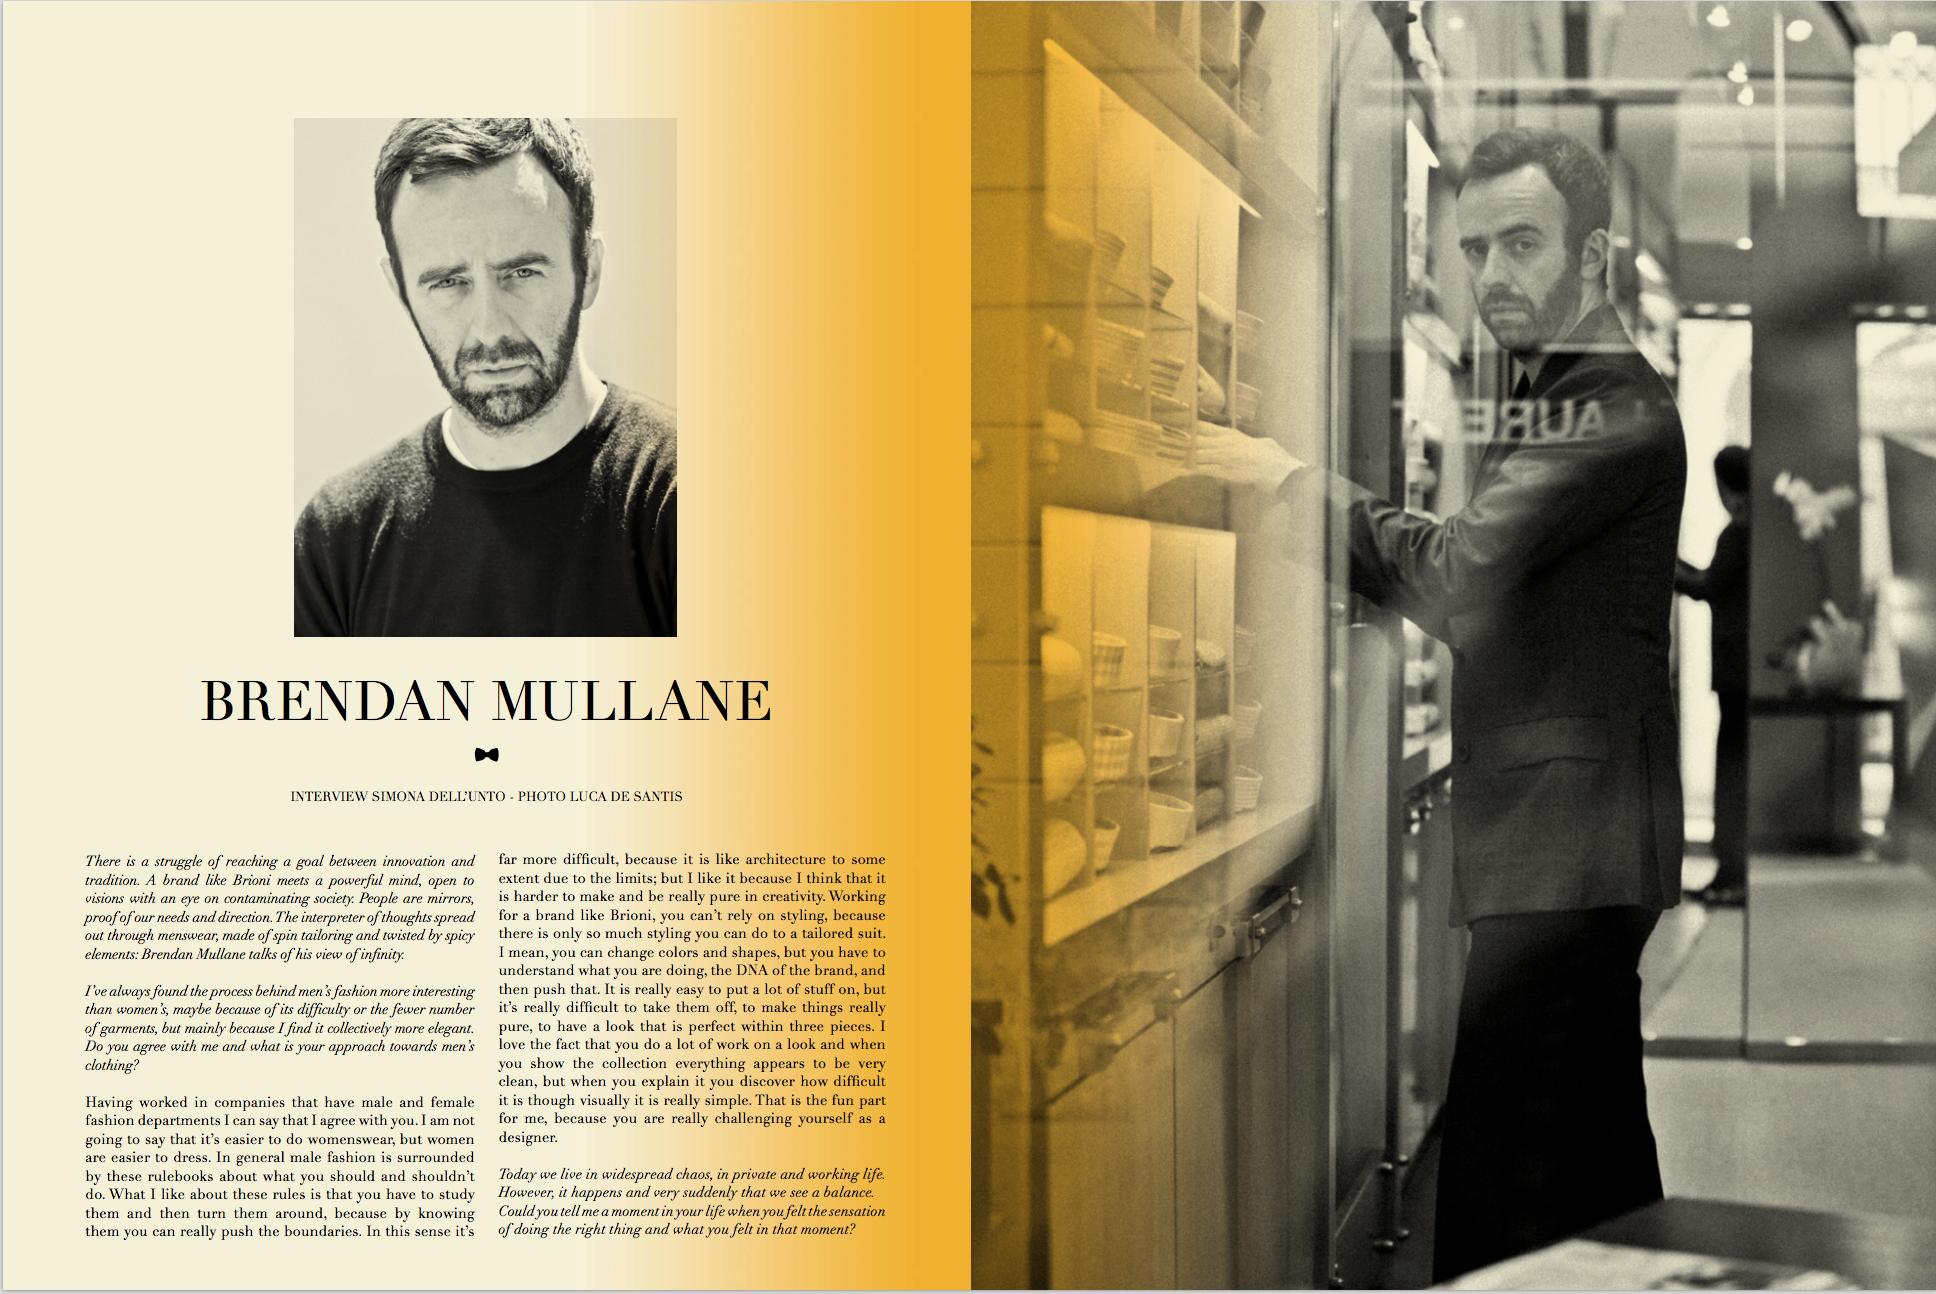 Brendan Mullane